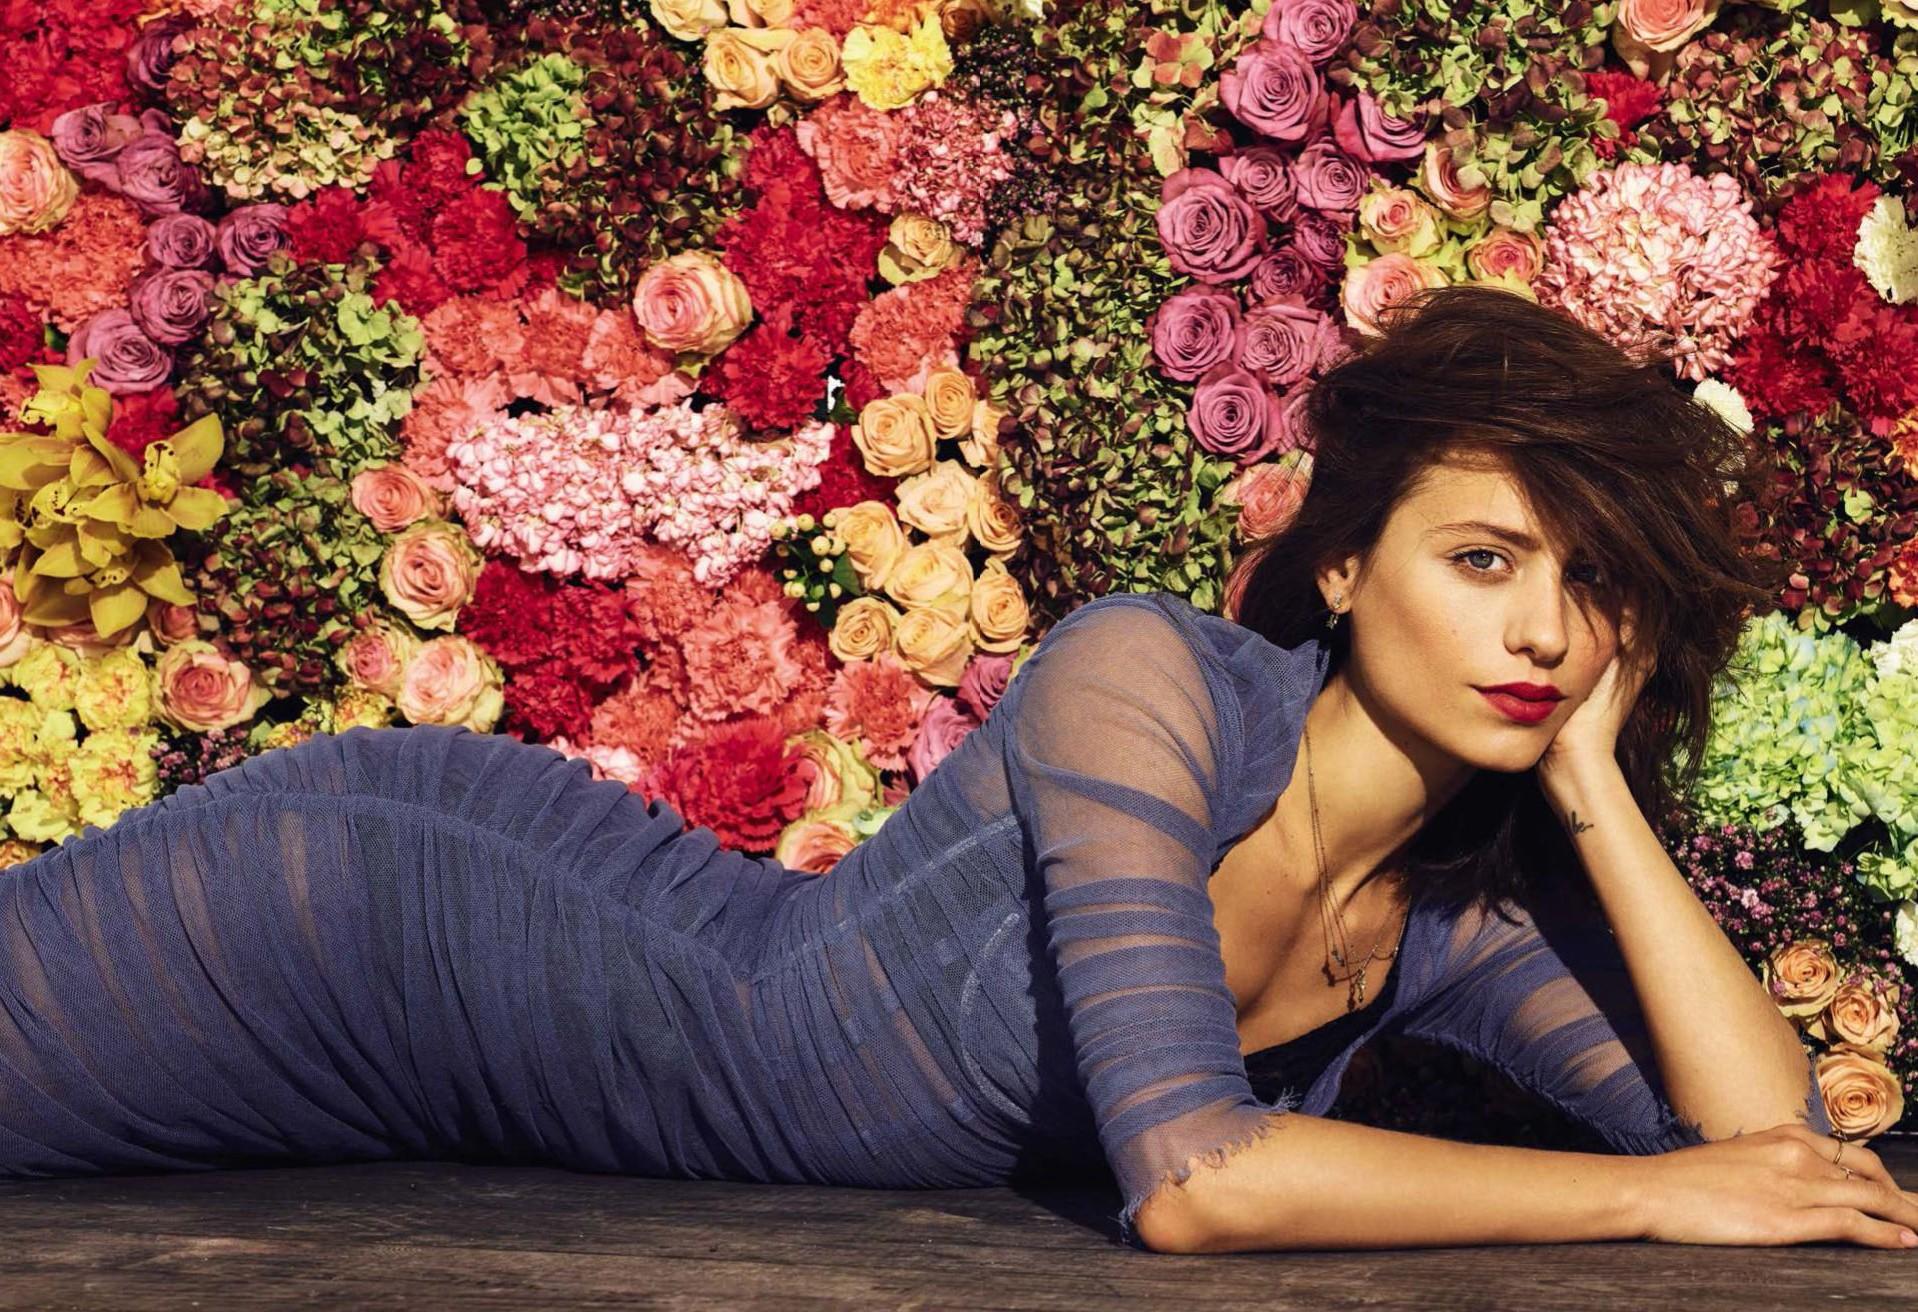 Michelle Jenner sin ropa